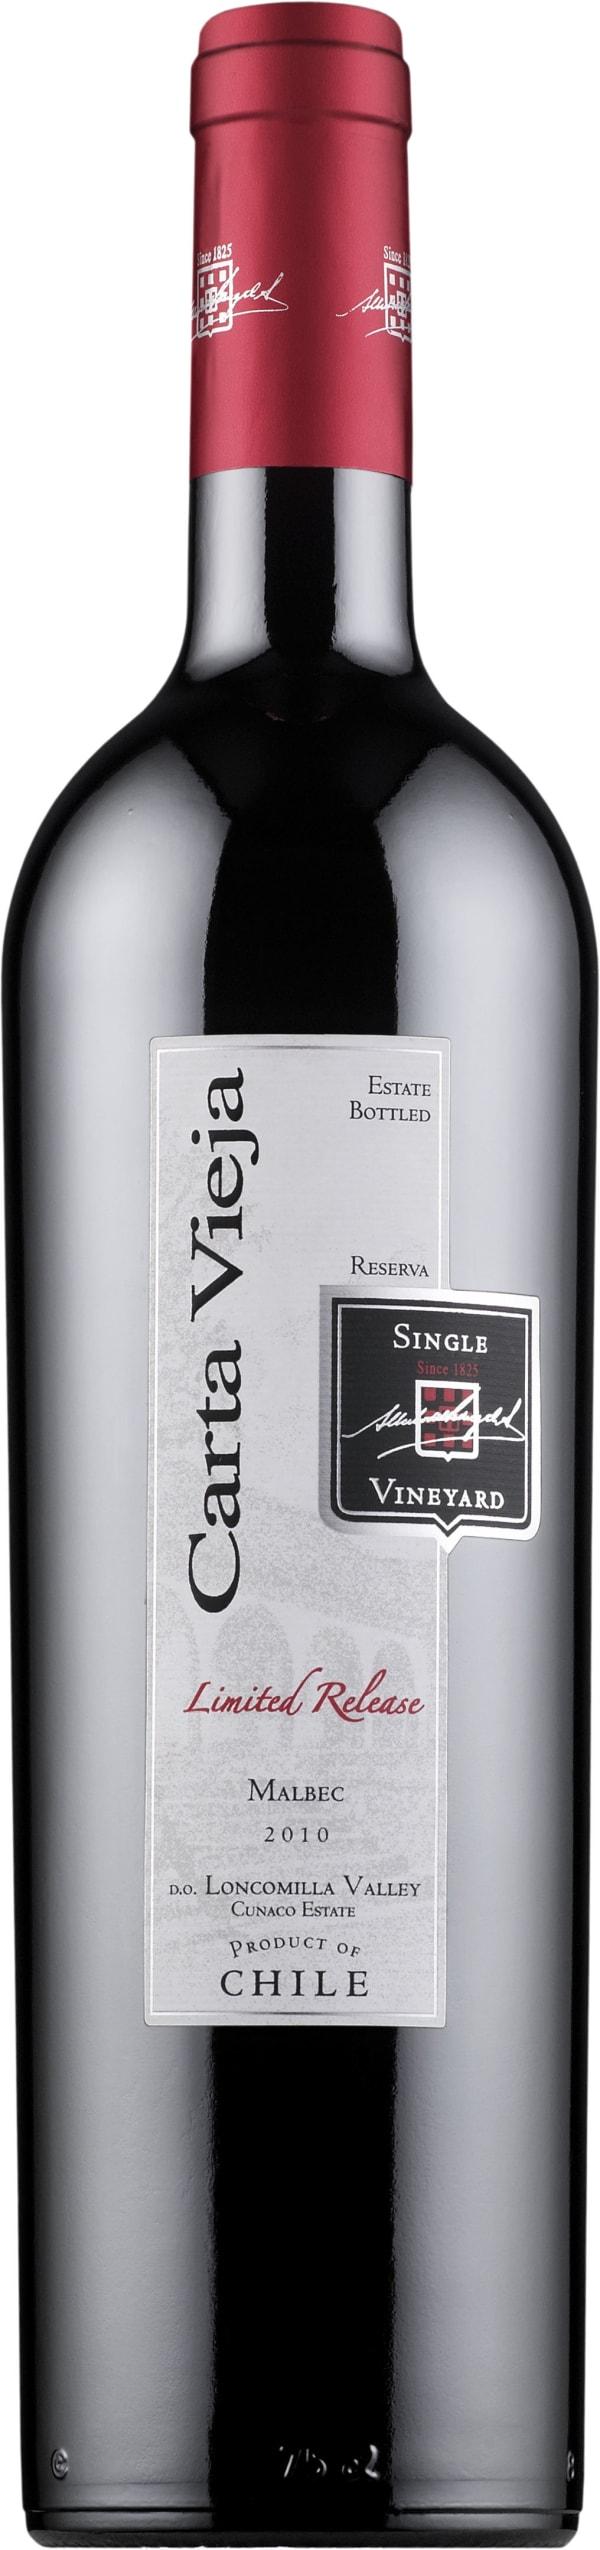 Carta Vieja Limited Release Malbec 2013